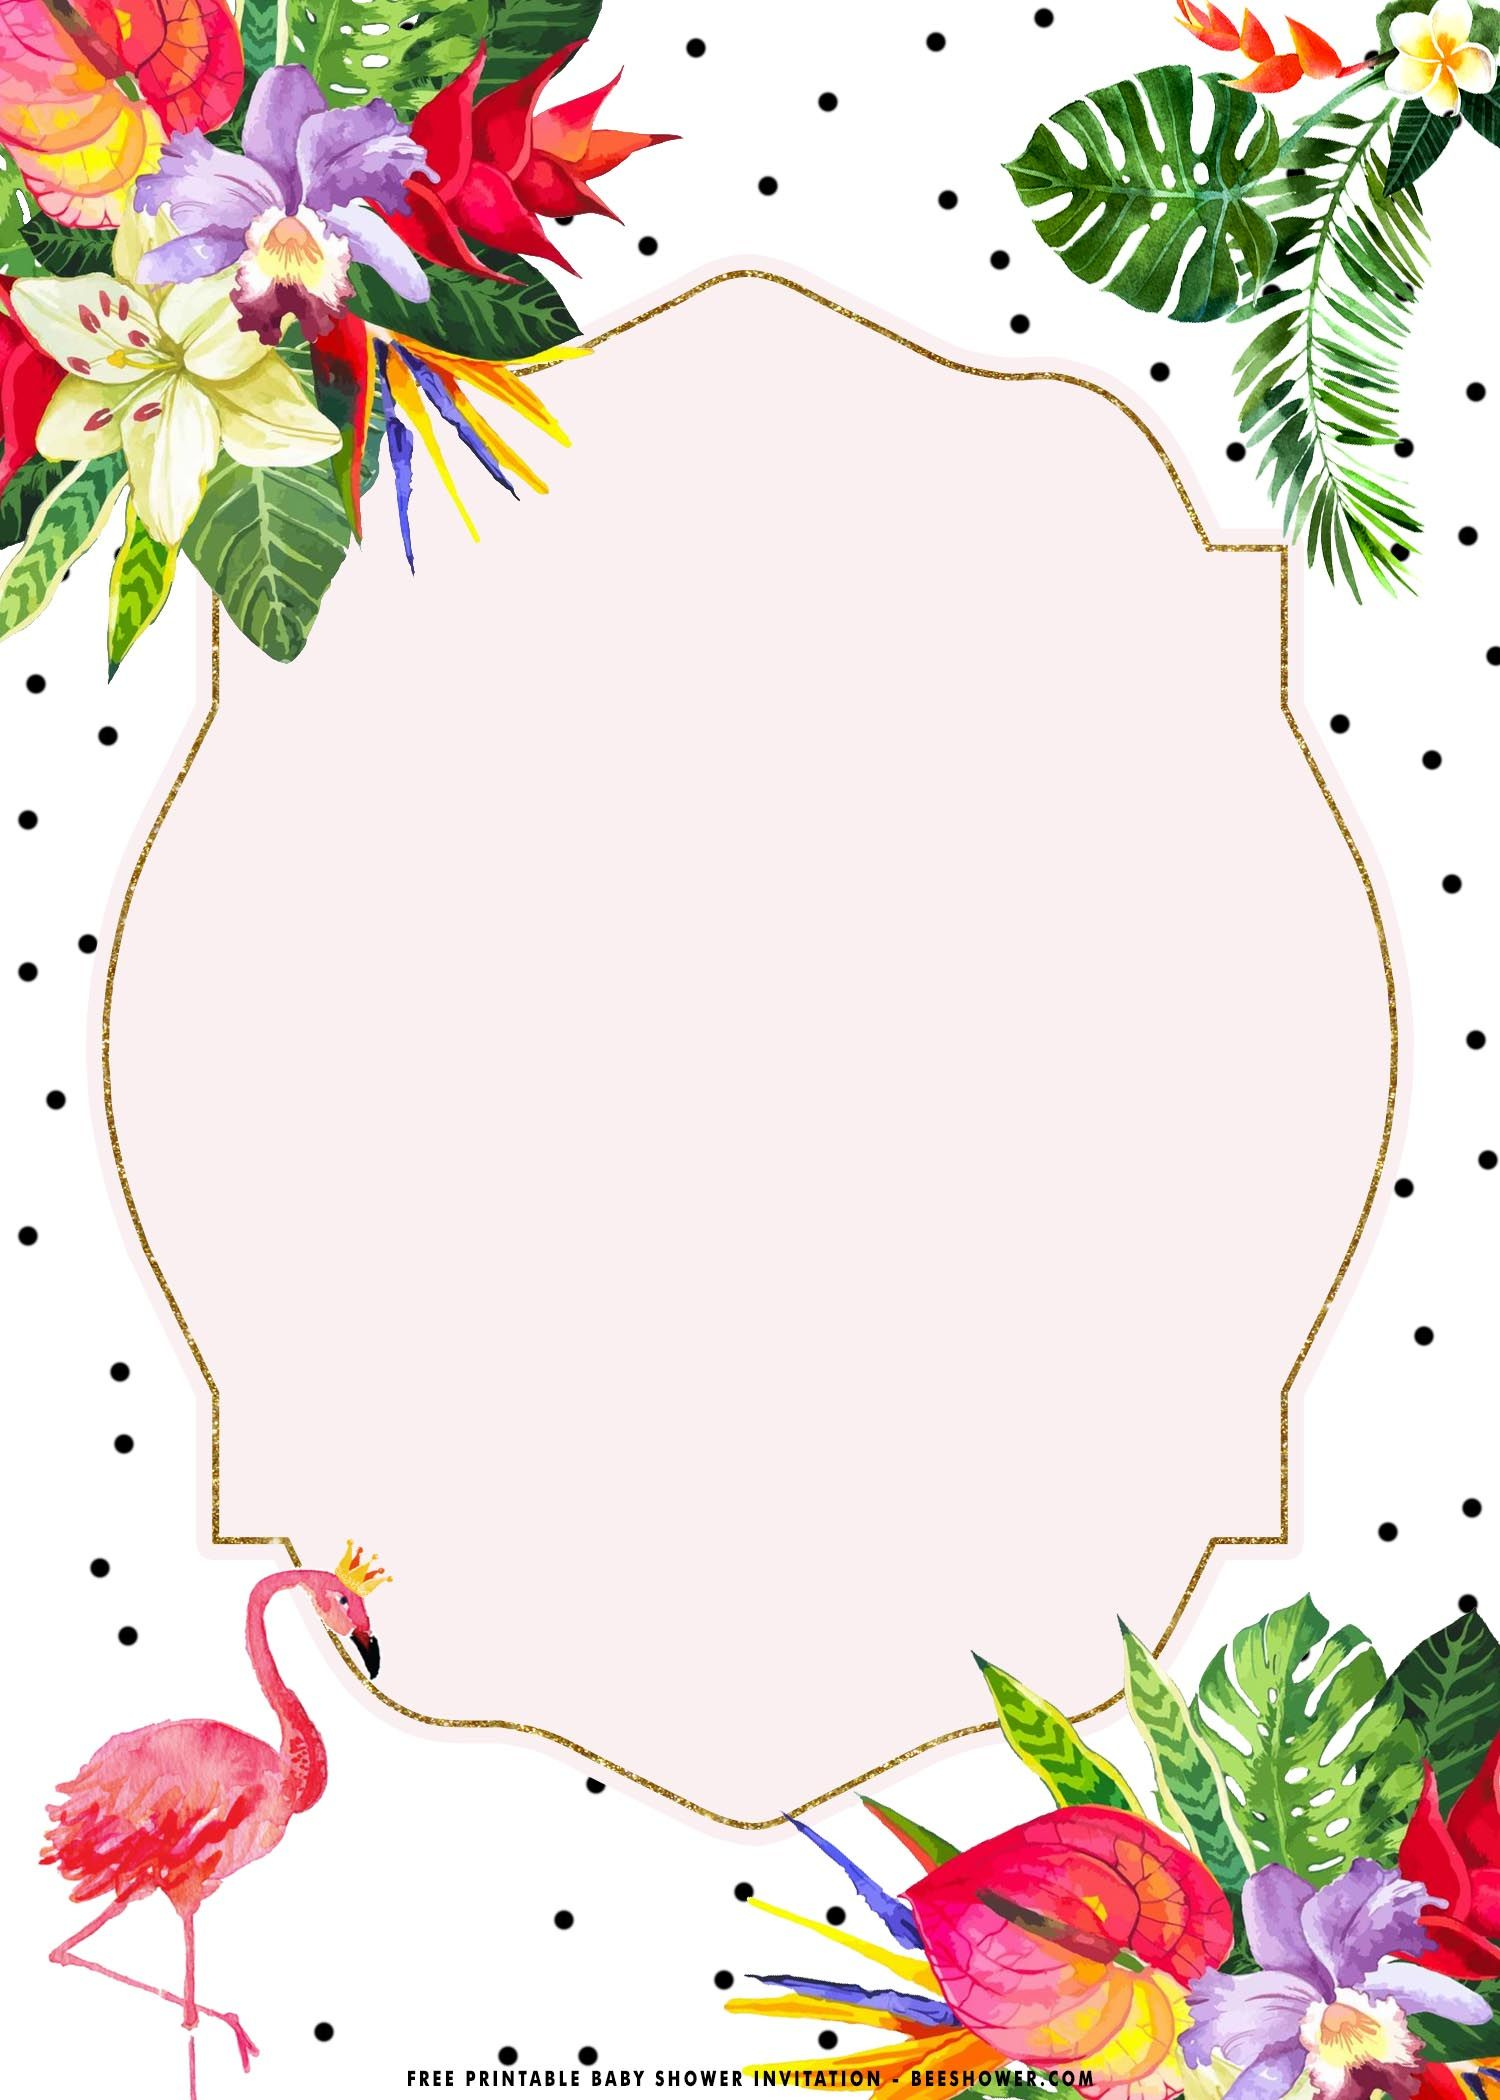 Free Printable Tropical Flamingo Birthday Invitations Templates Flamingo Birthday Invitations Free Printable Baby Shower Invitations Flamingo Birthday